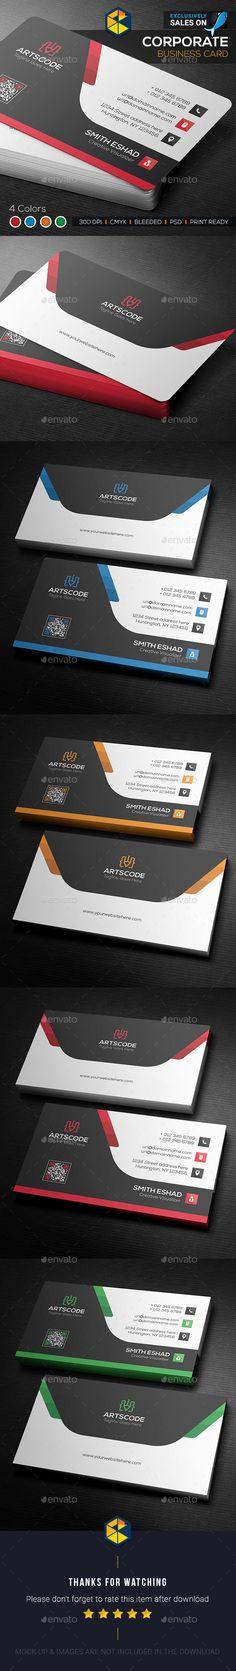 Color Shape Business Card Template PSD. Download here: https://graphicriver.net/item/color-shape-business-card/17424335?ref=ksioks